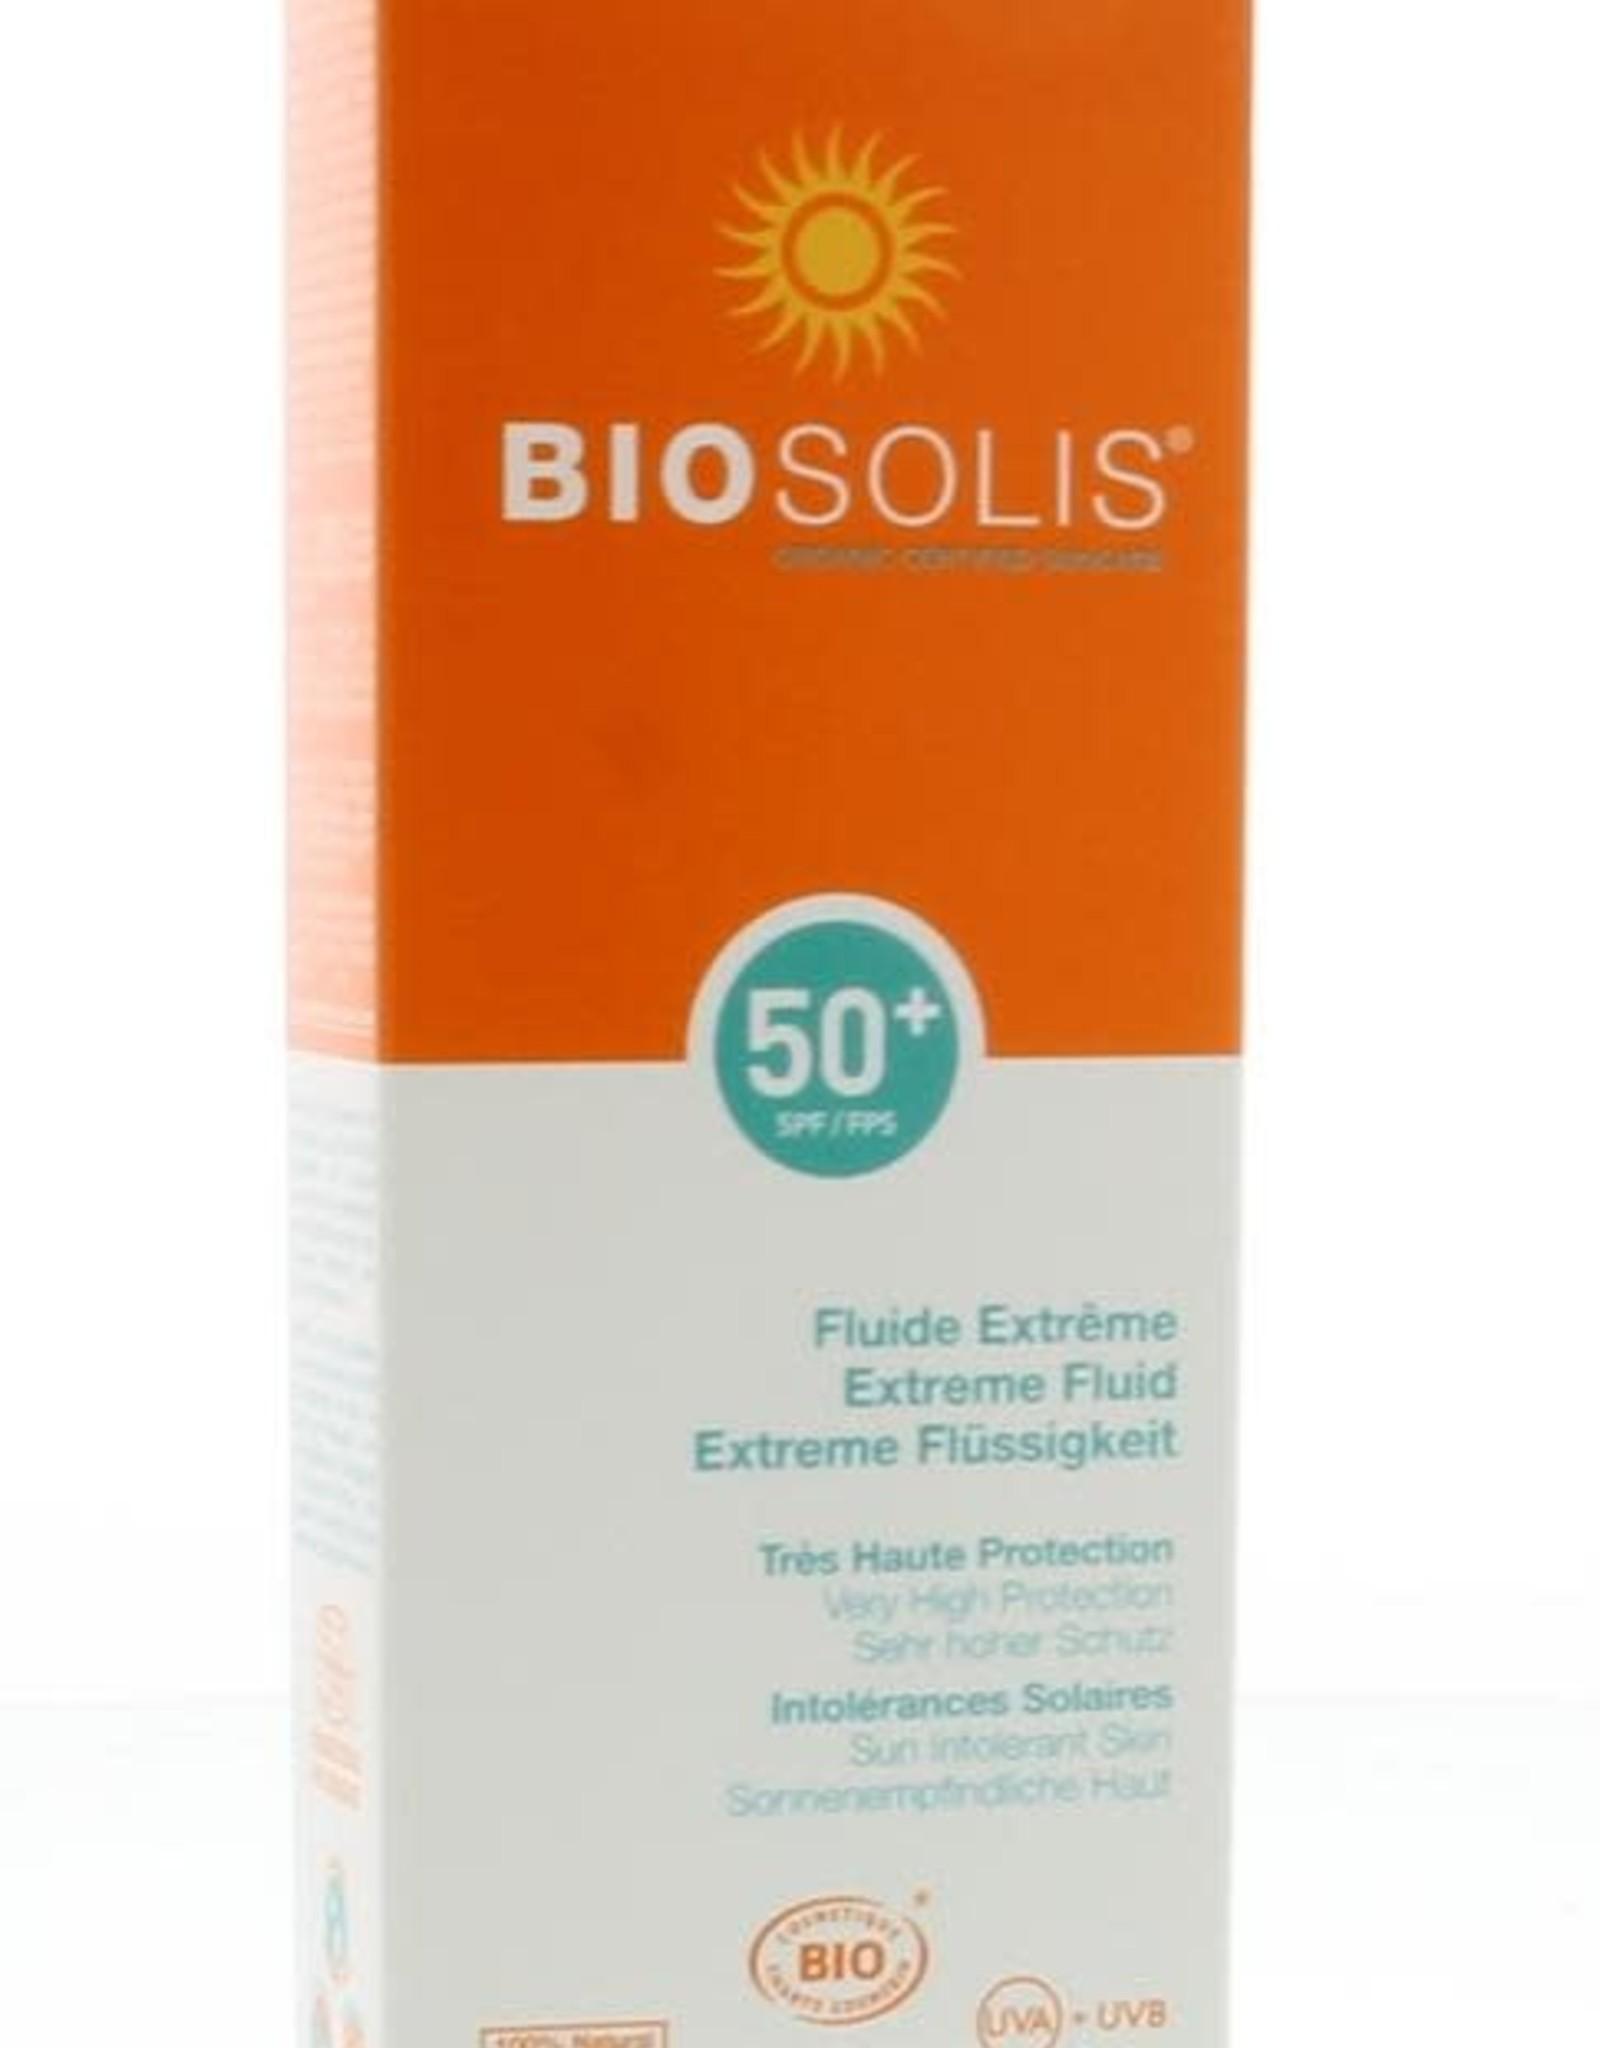 Biosolis Extreme fluid SPF 50+ 40ml